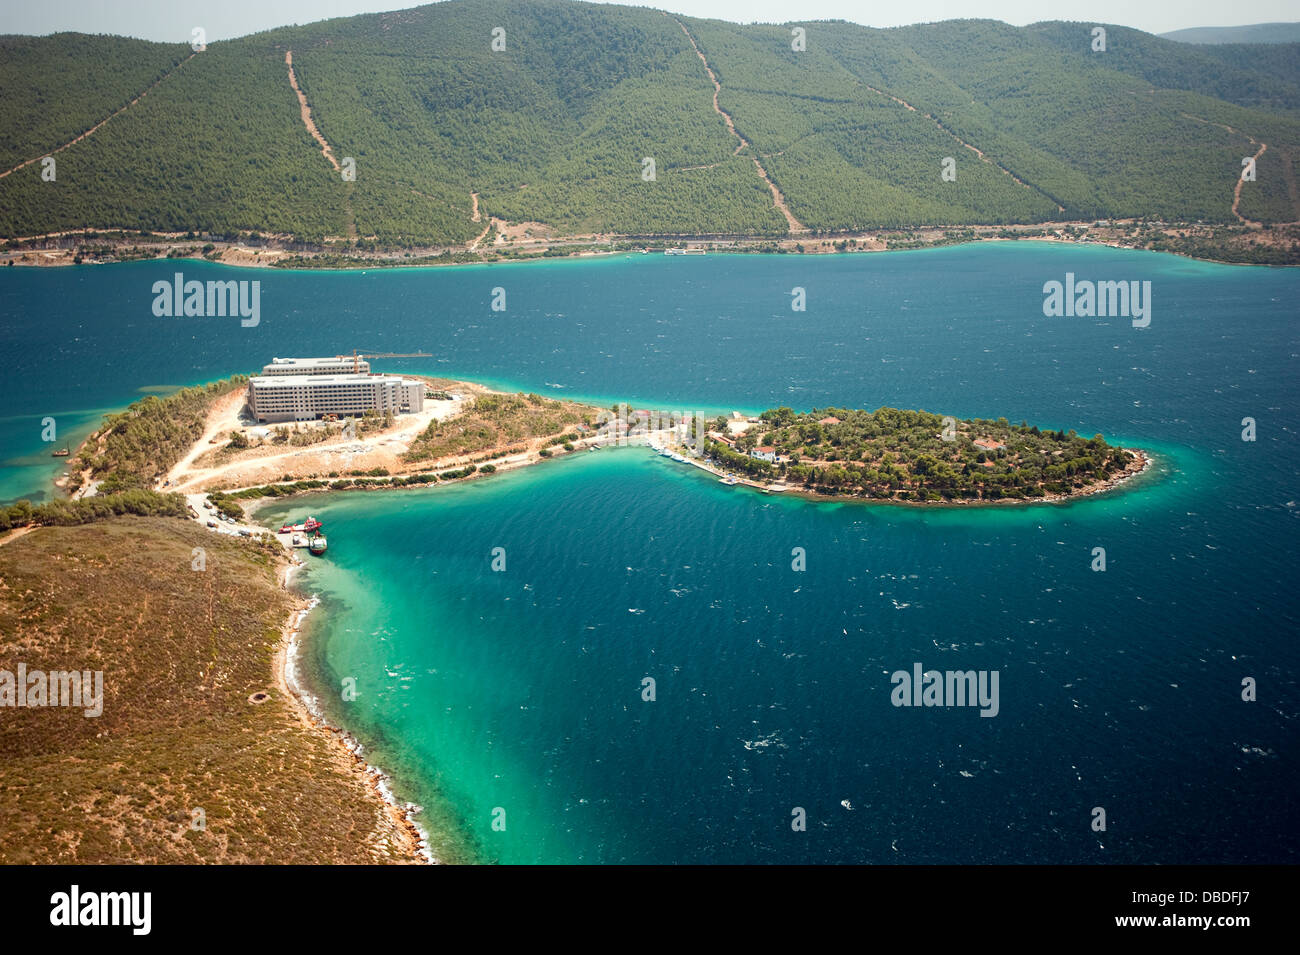 Aerial view of coastal development hotel construction and environmental impact in Güllük Bay Bodrum Turkey - Stock Image